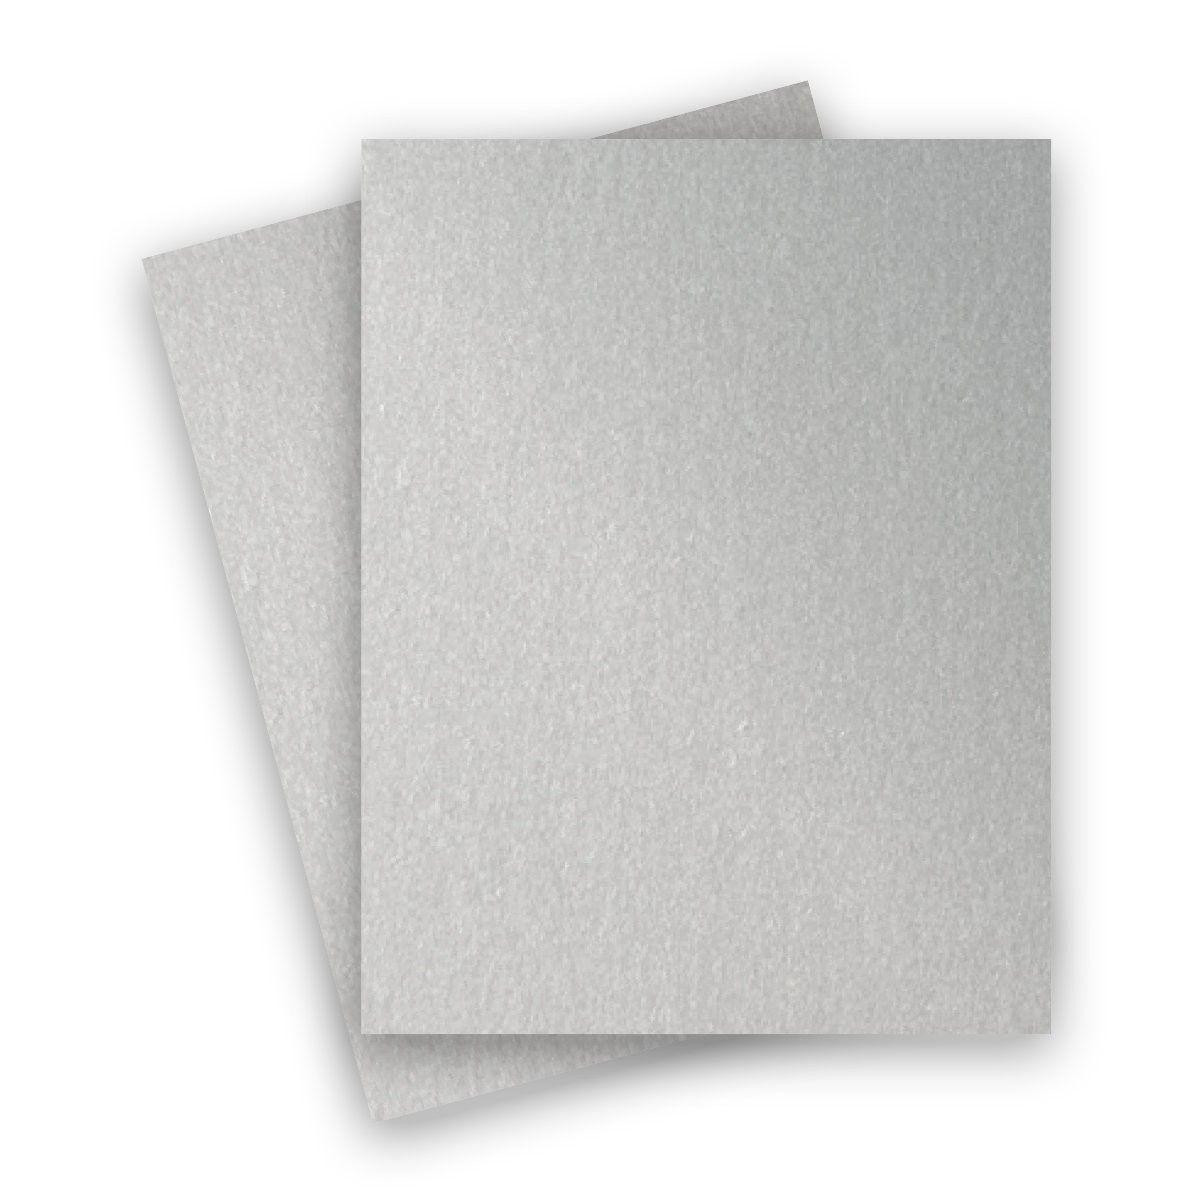 Stardream Metallic - 8.5X11 Card Stock Paper - SILVER ...